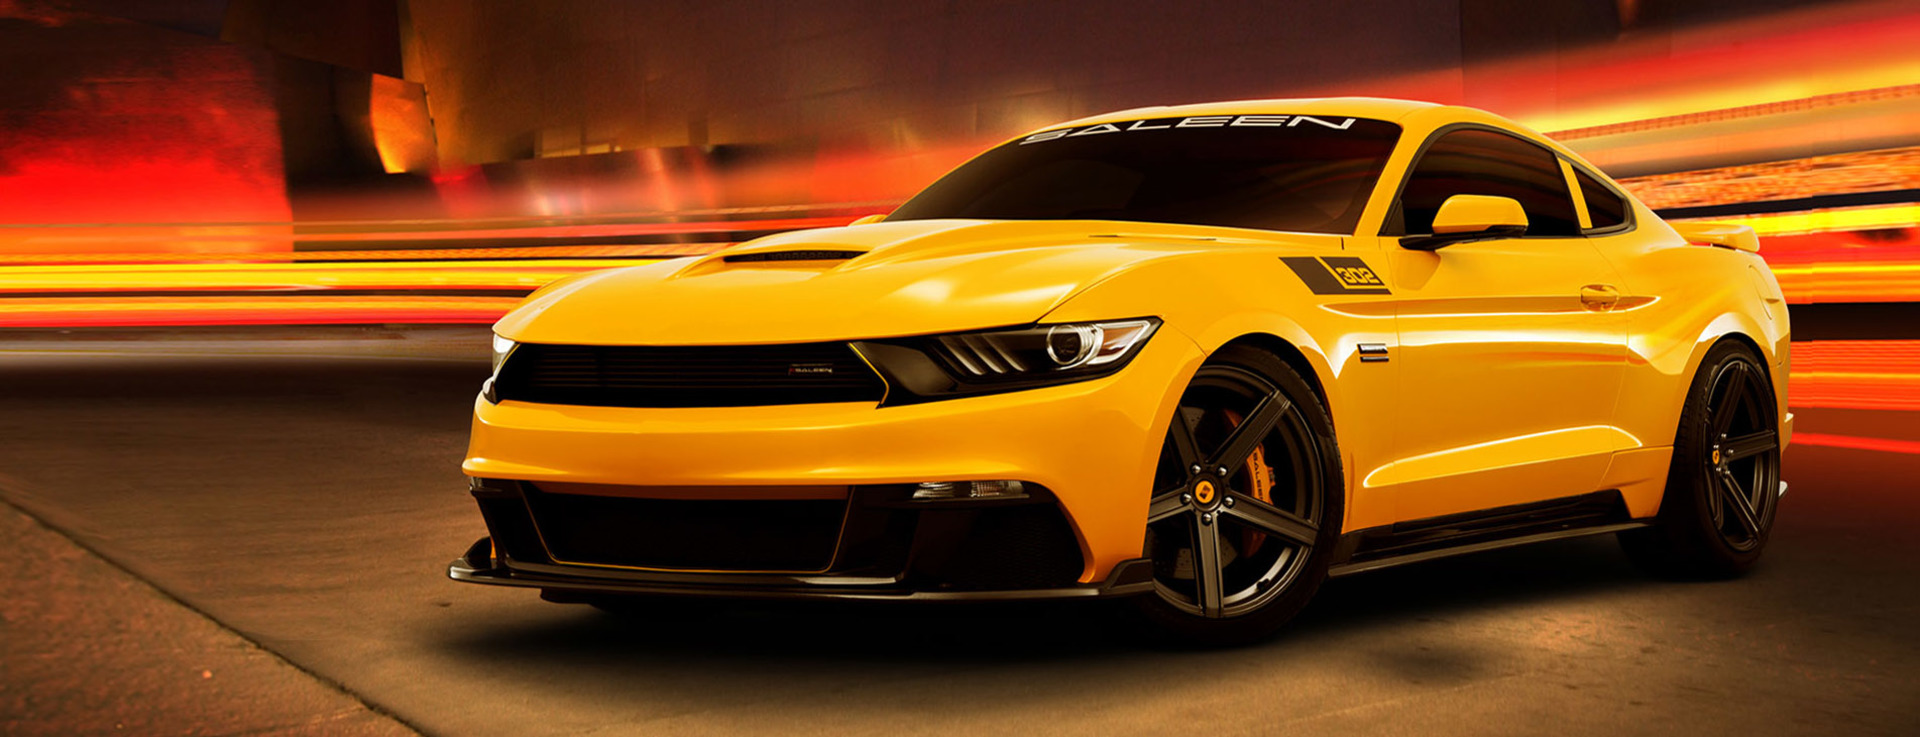 https://x-assets.autorevo-powersites.com/content/assets/clients/ec94b611-bce2-4b58-b365-a2173469b994/Ford_Mustang_Hero